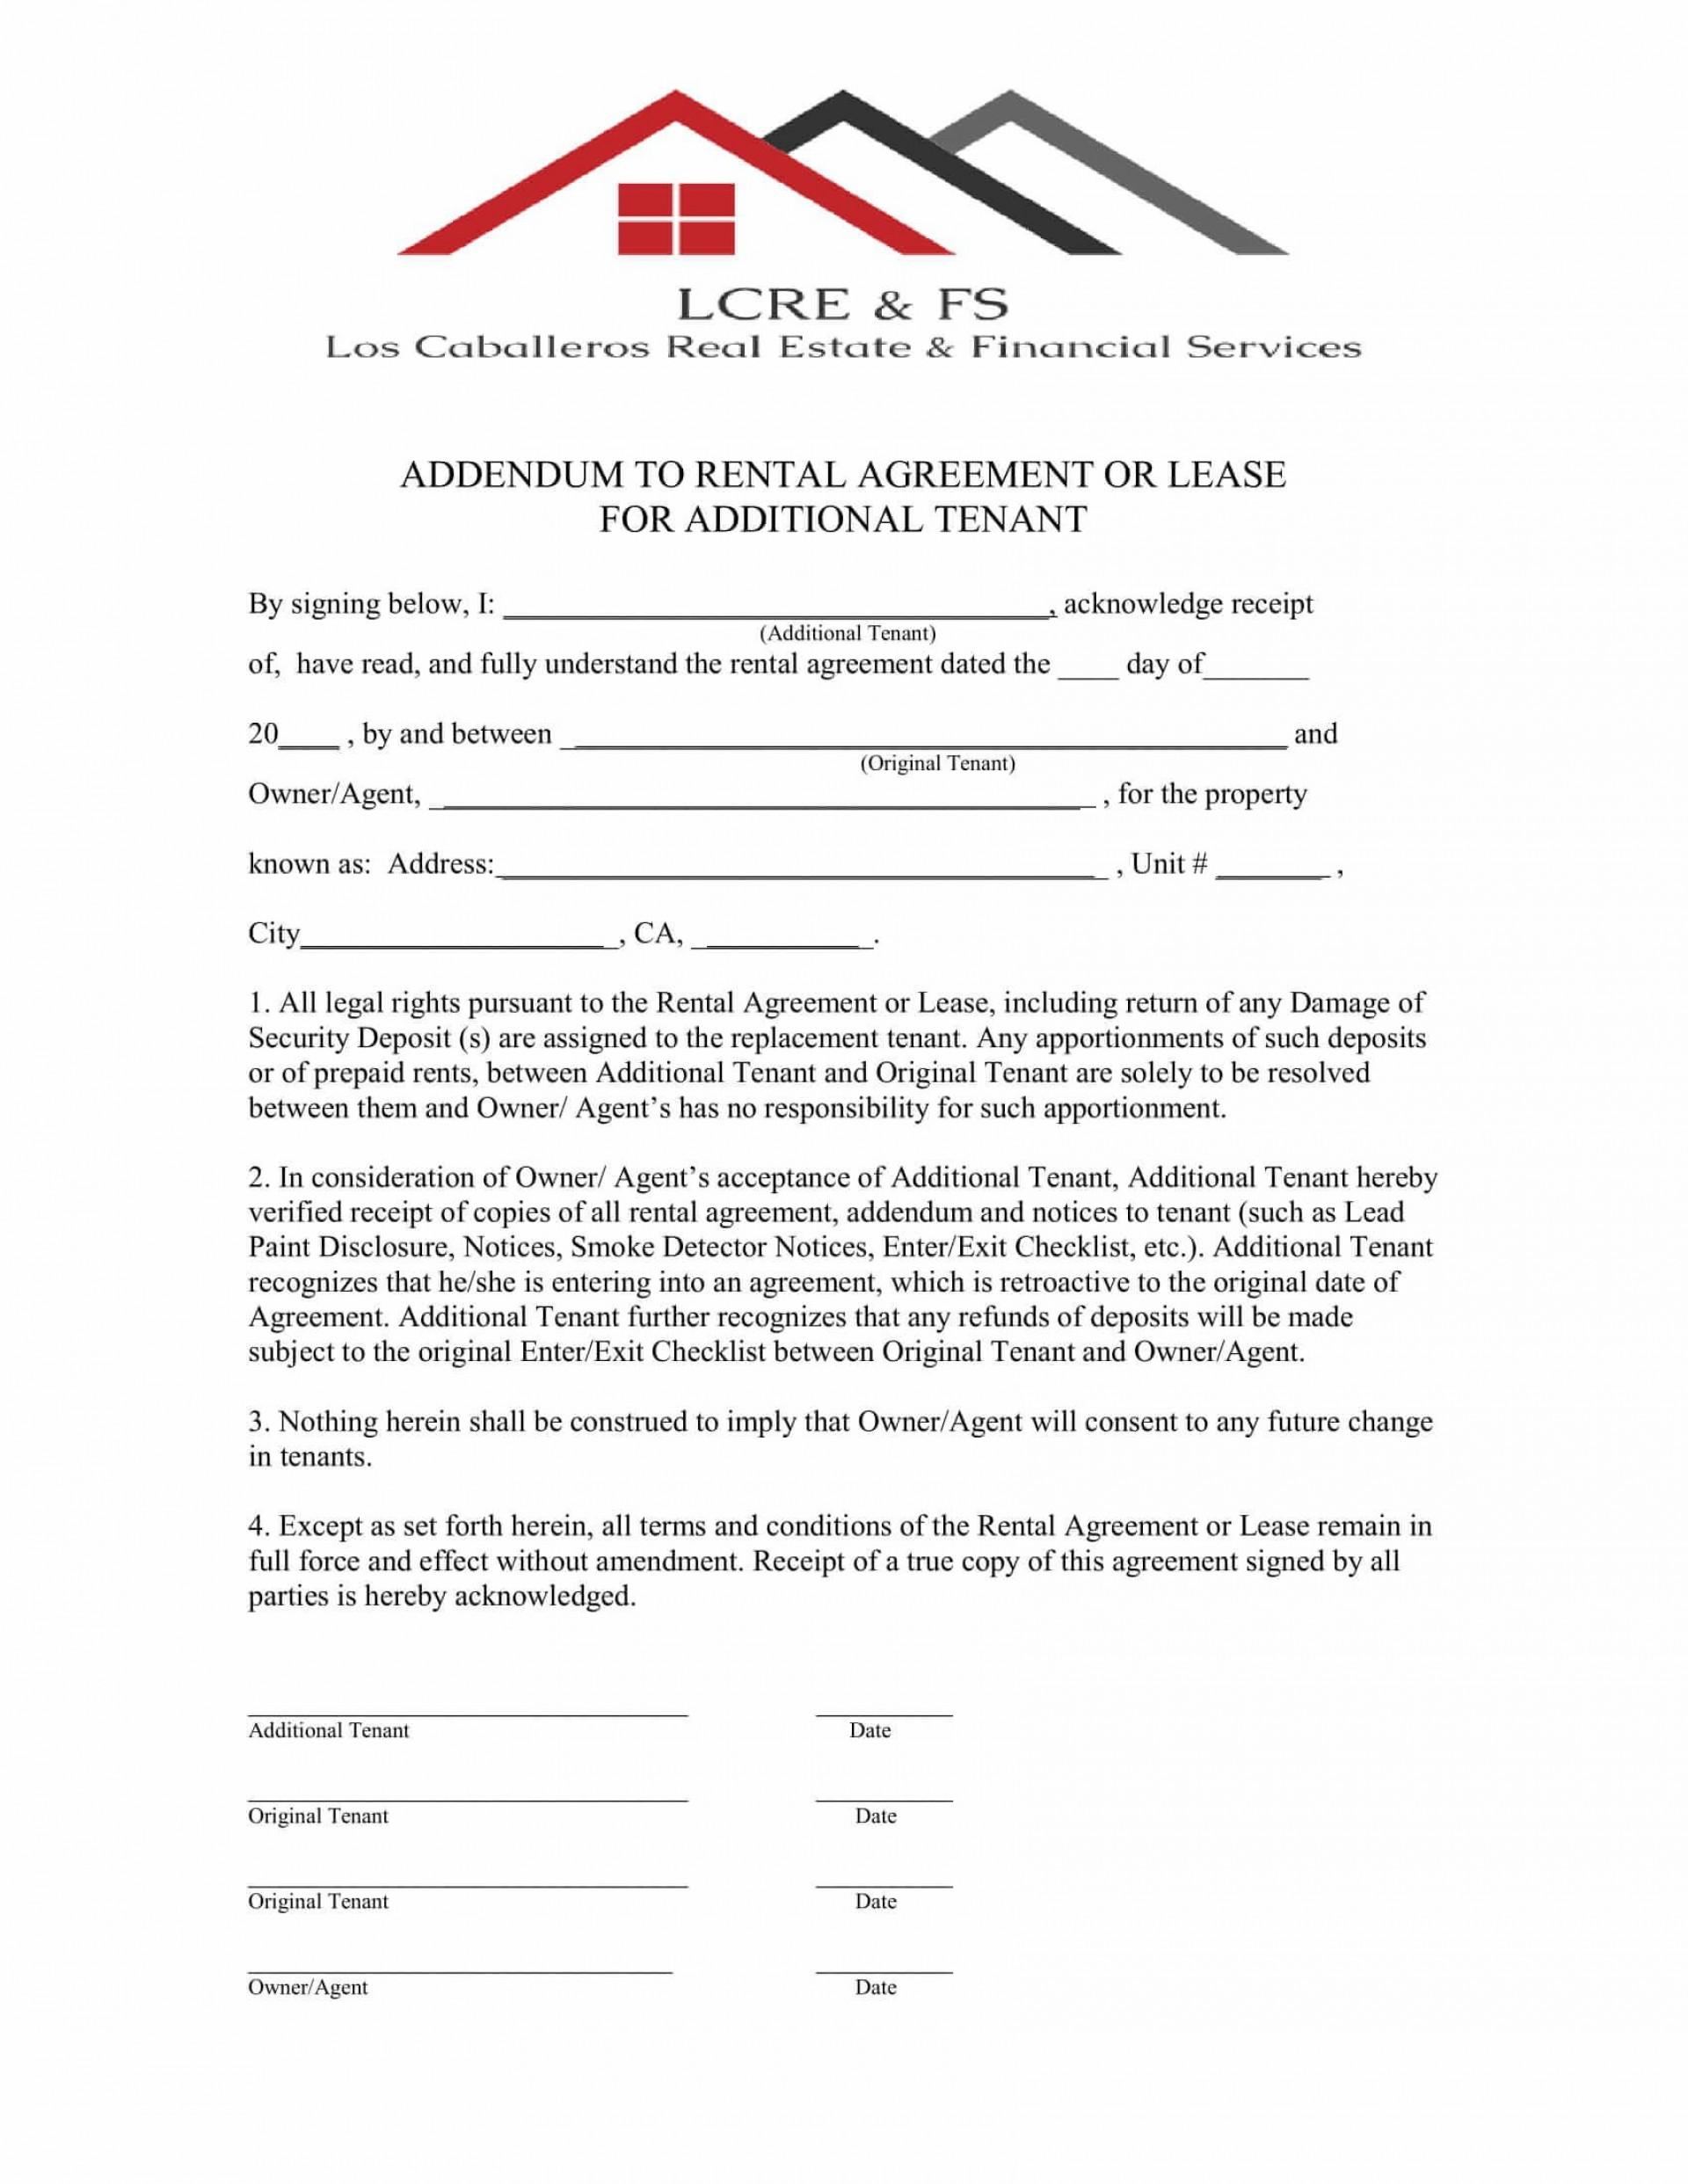 009 Singular Addendum Form For Rental Agreement Highest Quality 1920